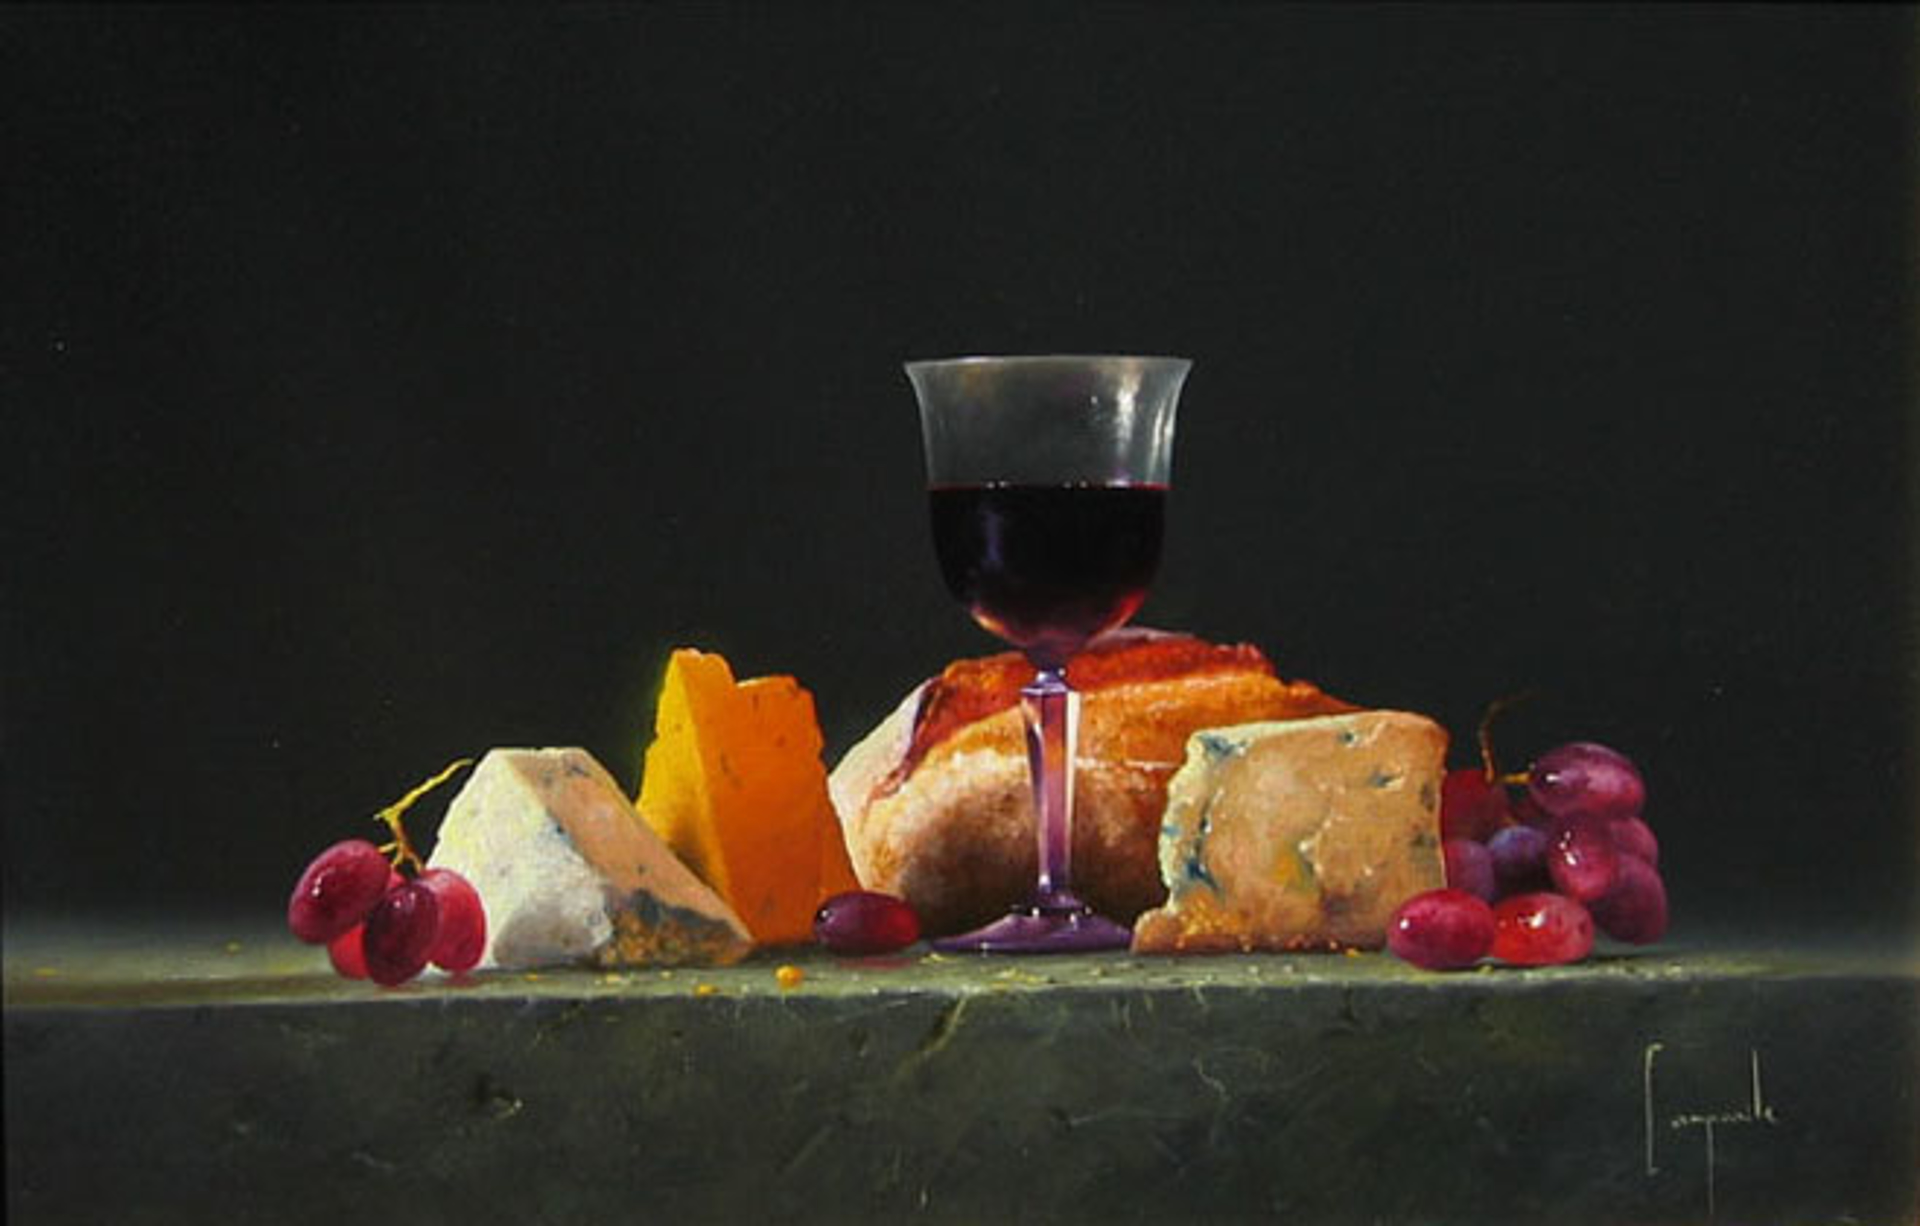 L'Antipasto by Dario Campanile